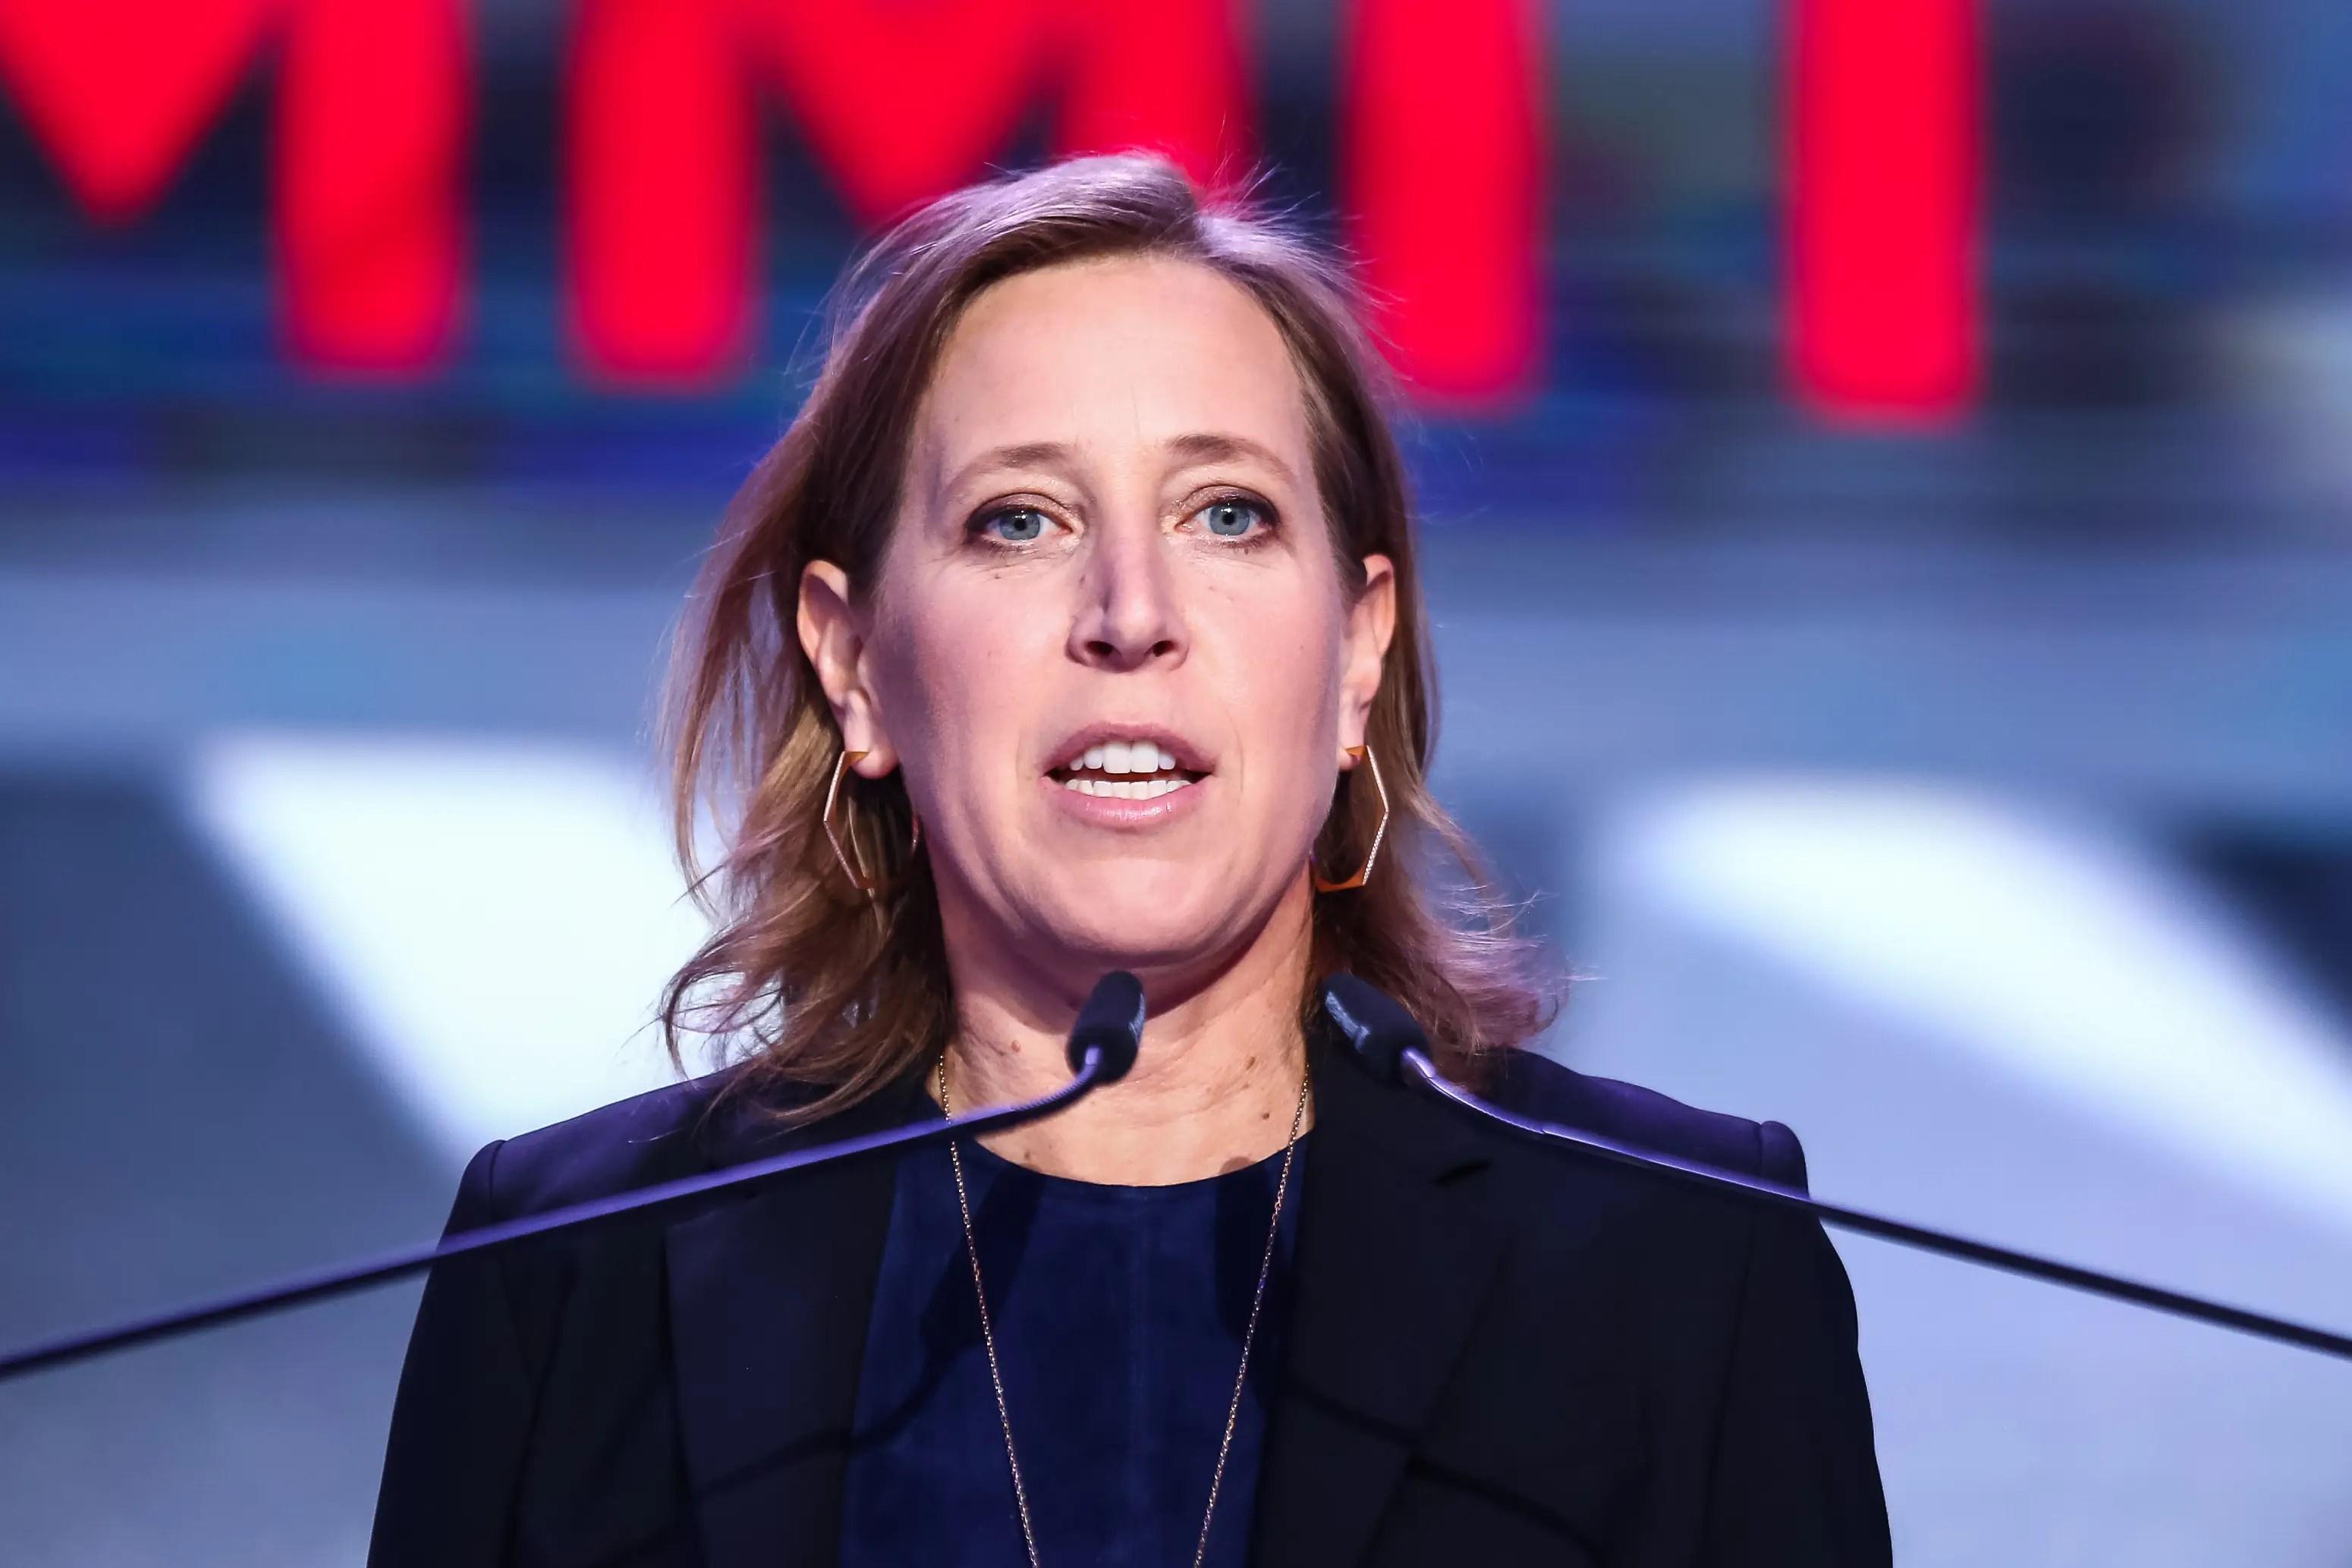 Everything you need to know about susan wojcicki's net worth in 2021, bio, age,. Youtube Ceo Susan Wojcicki Life Career Net Worth